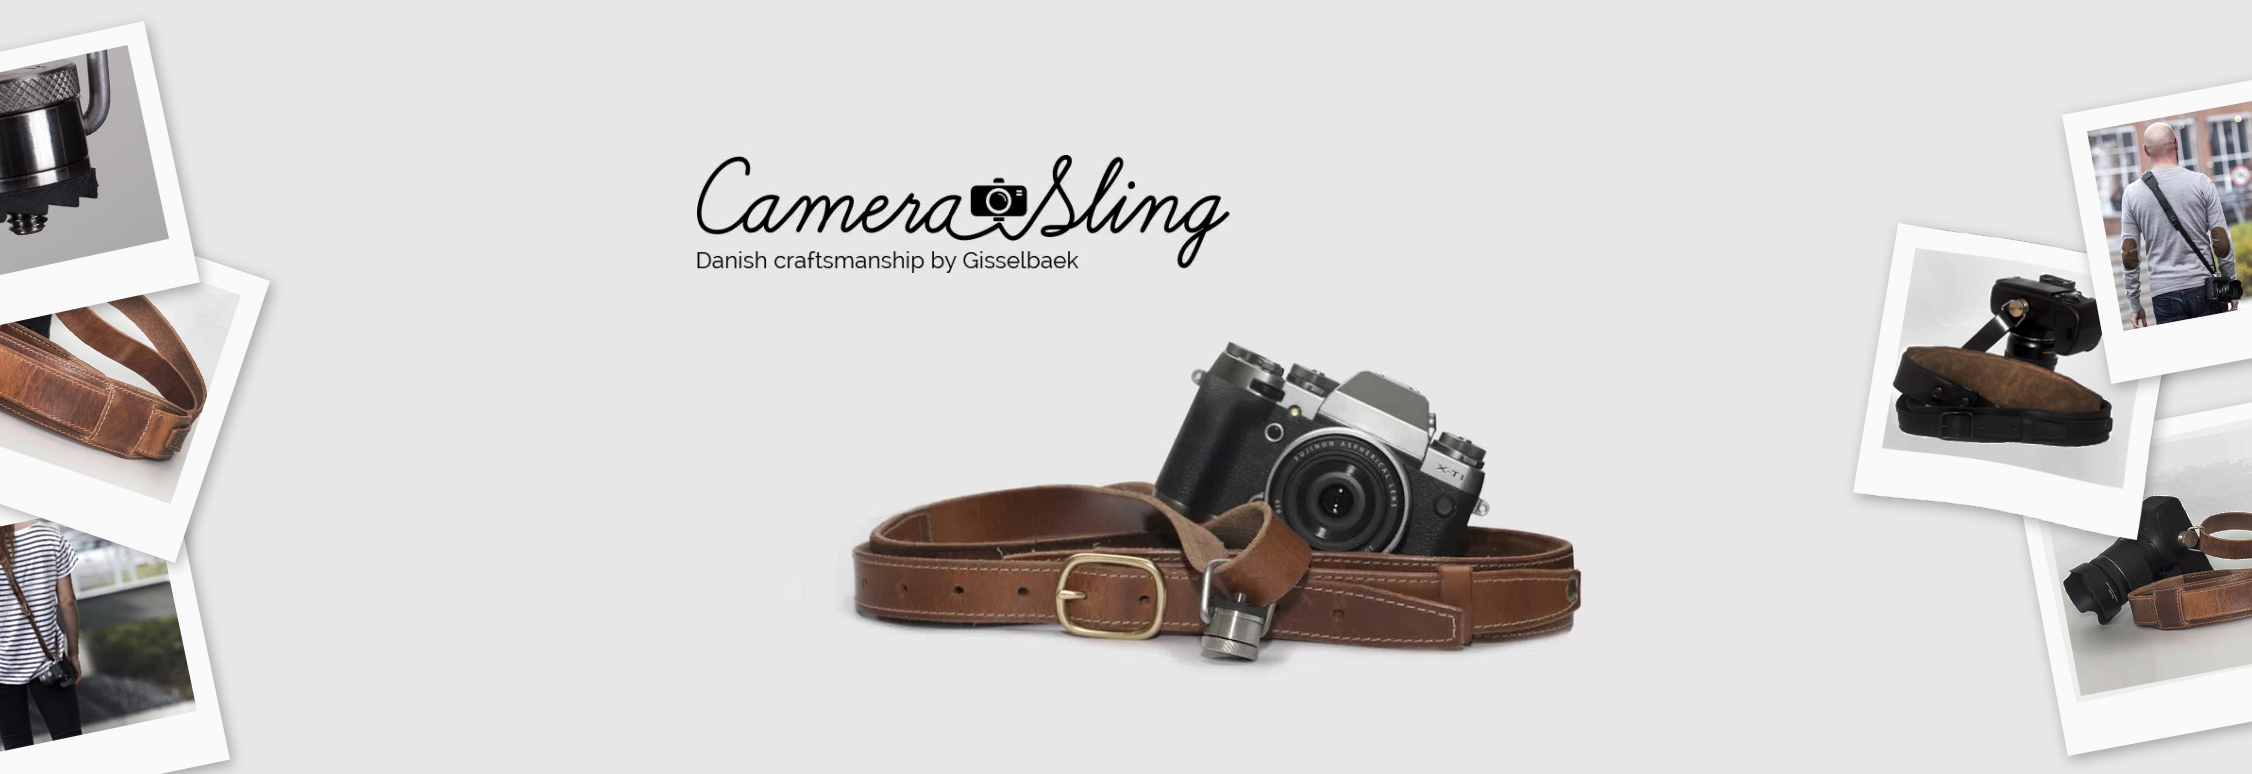 Camera Sling Hero cover